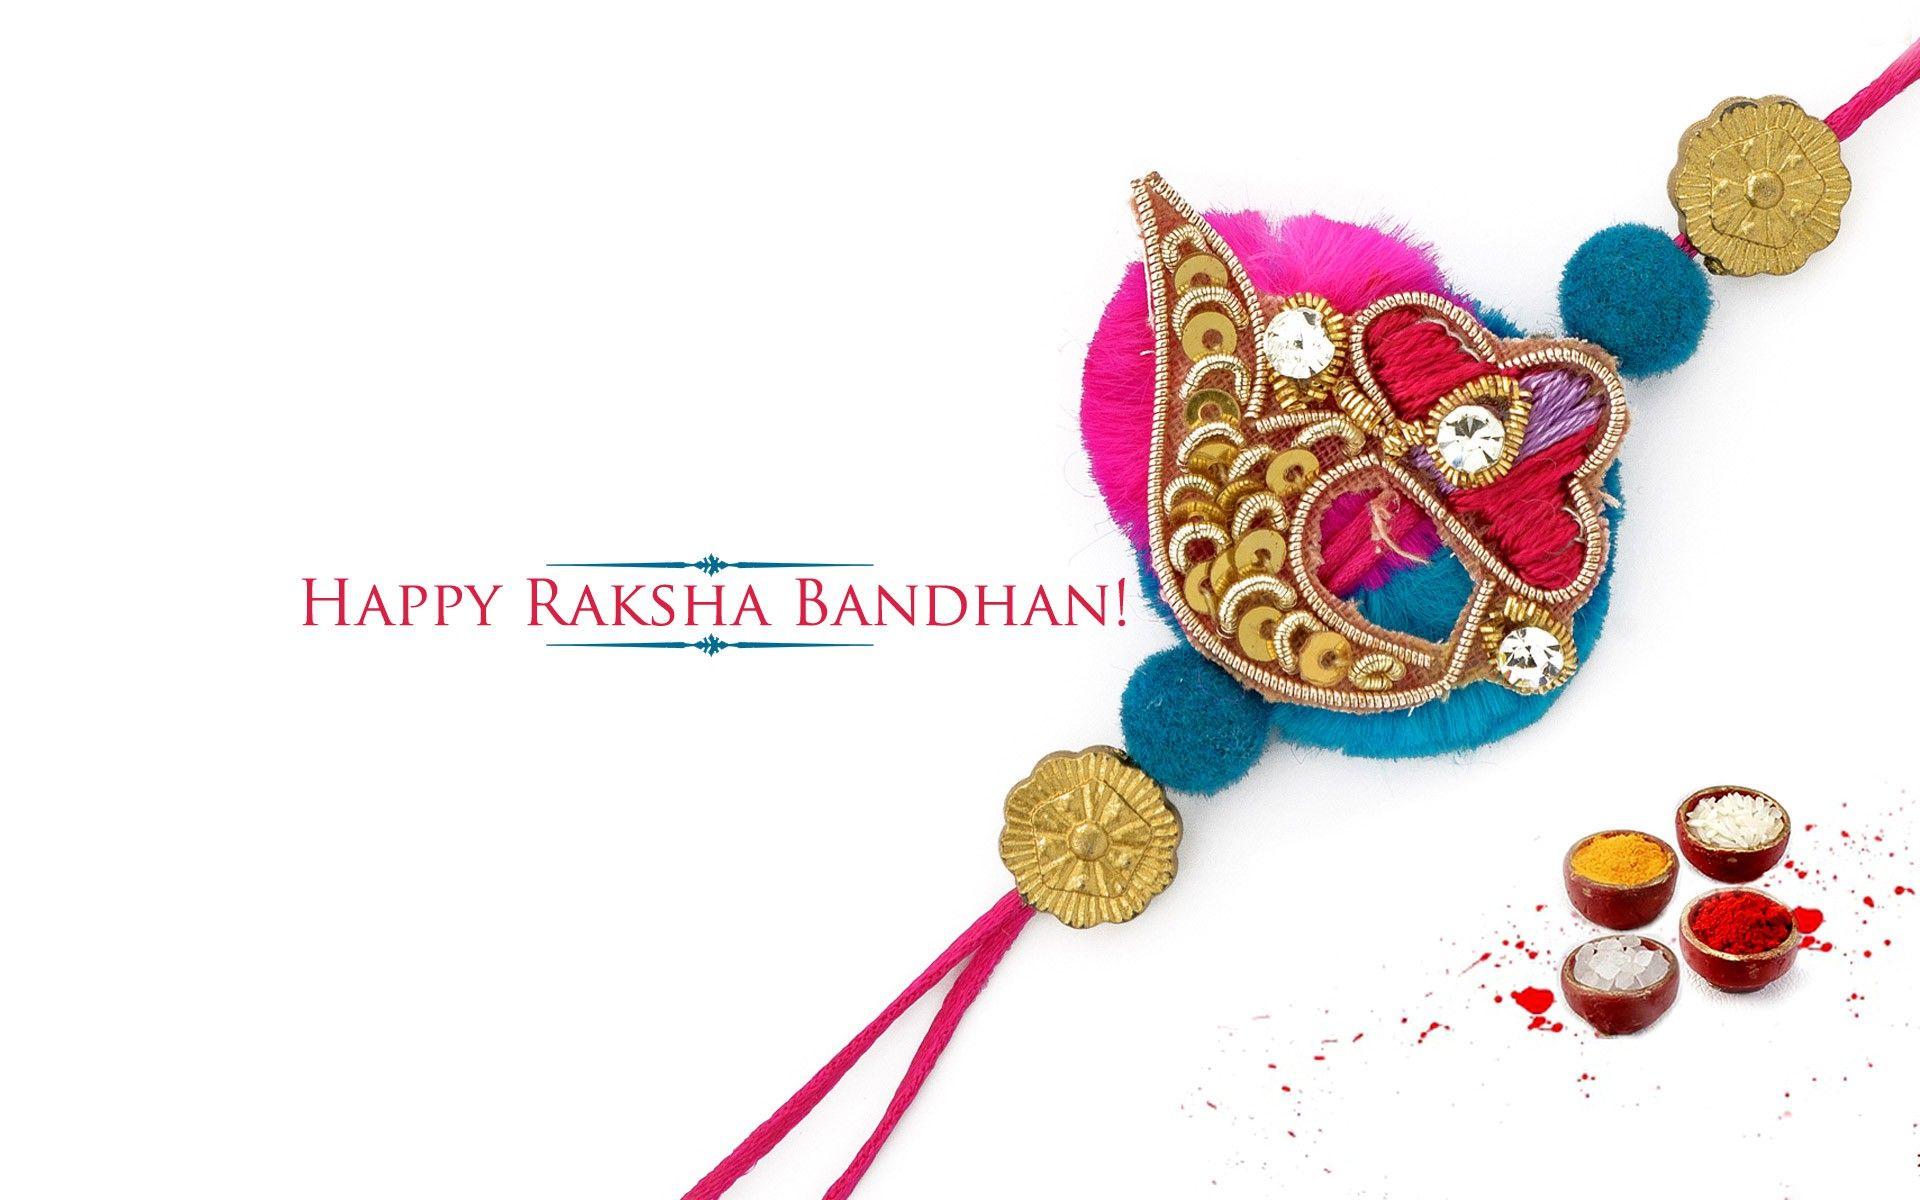 Happy Raksha Bandhan Raksha Bandhan Images Rakhi Images Raksha